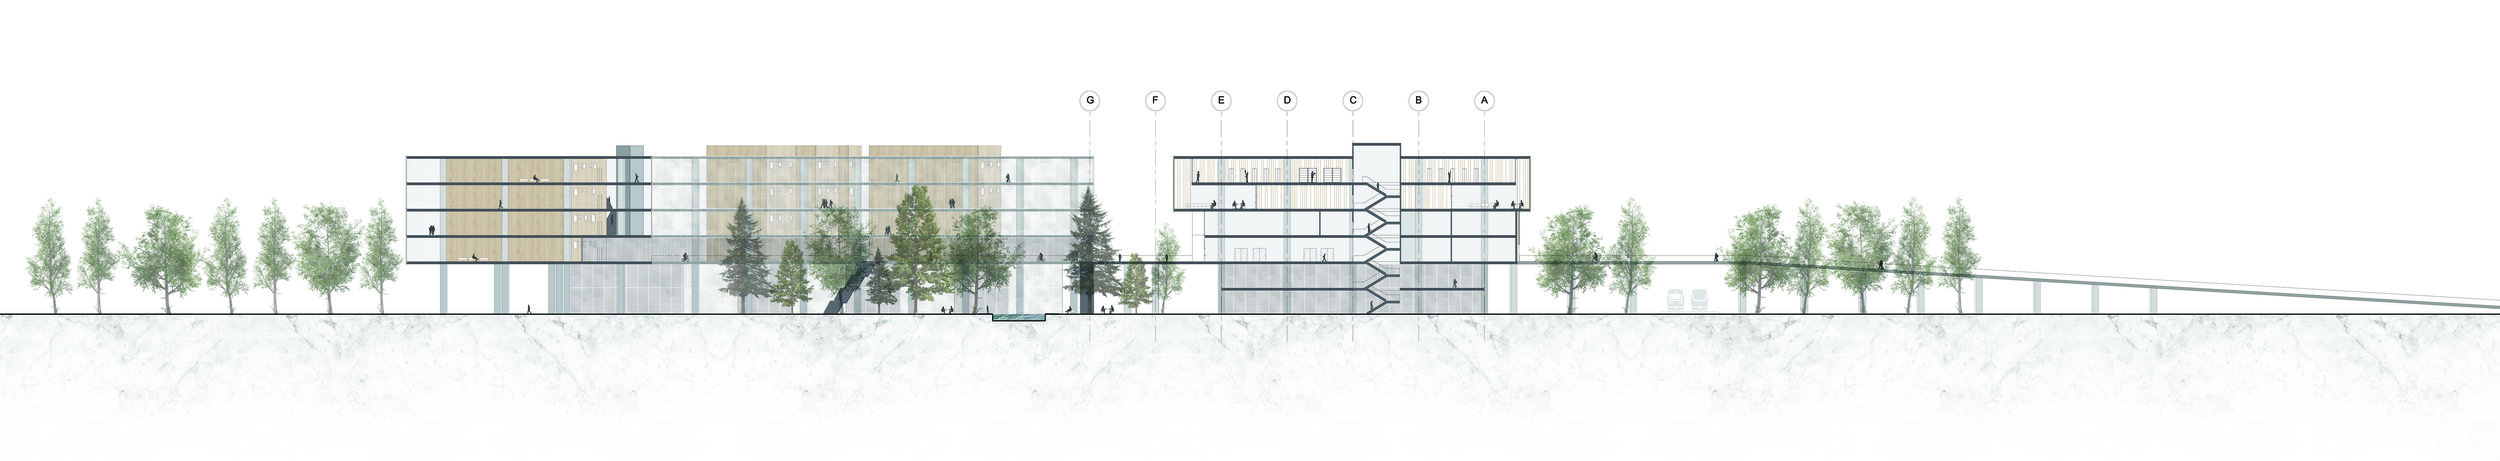 section_courtyard_min.jpg